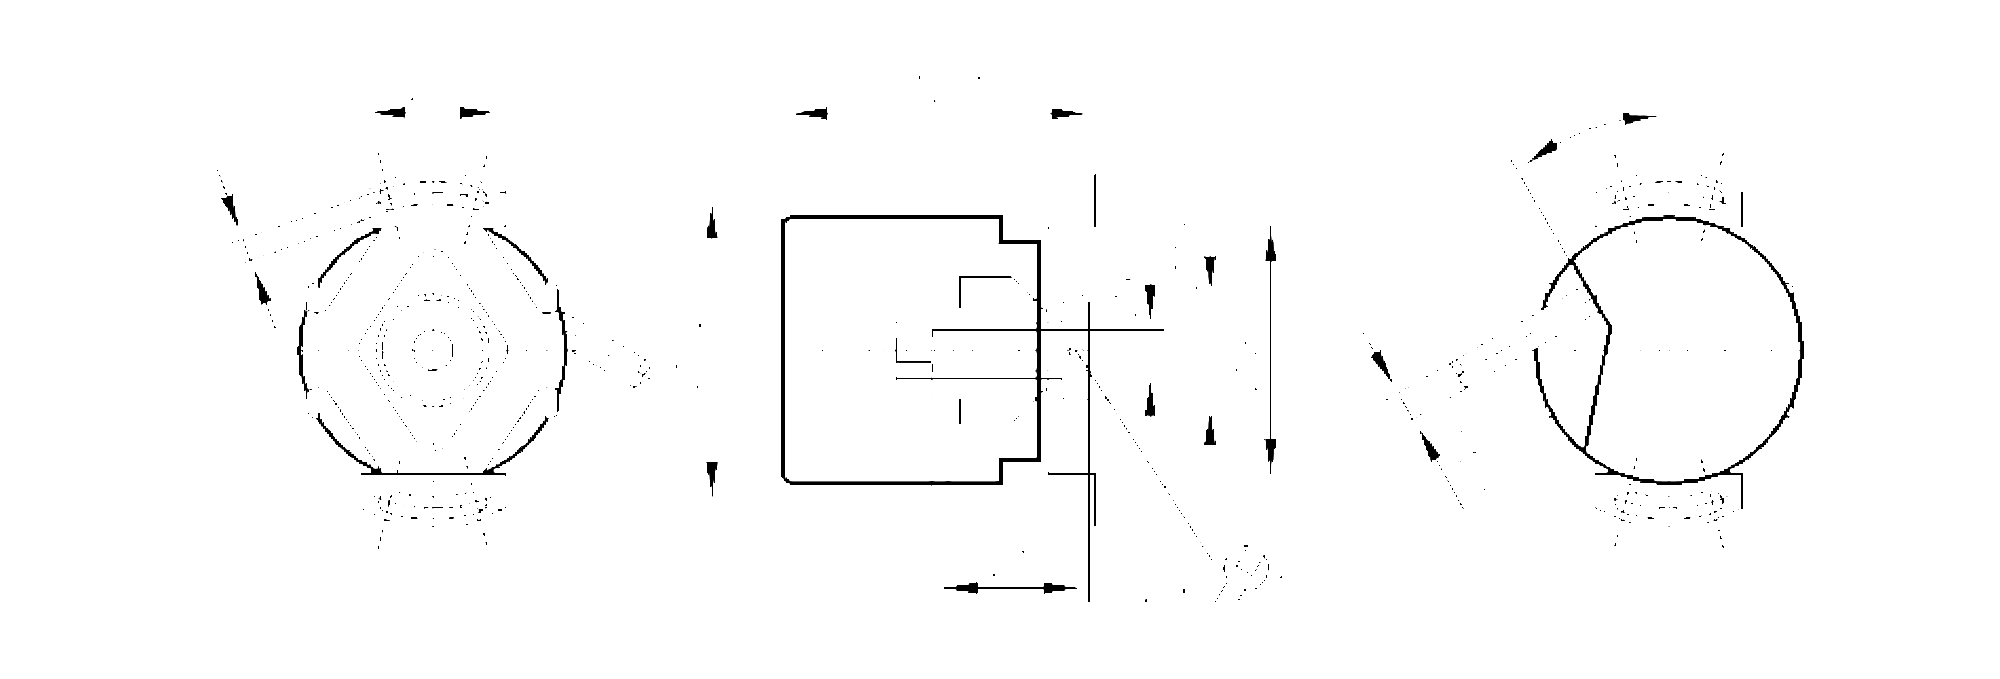 ra6007 - incremental encoder with hollow shaft